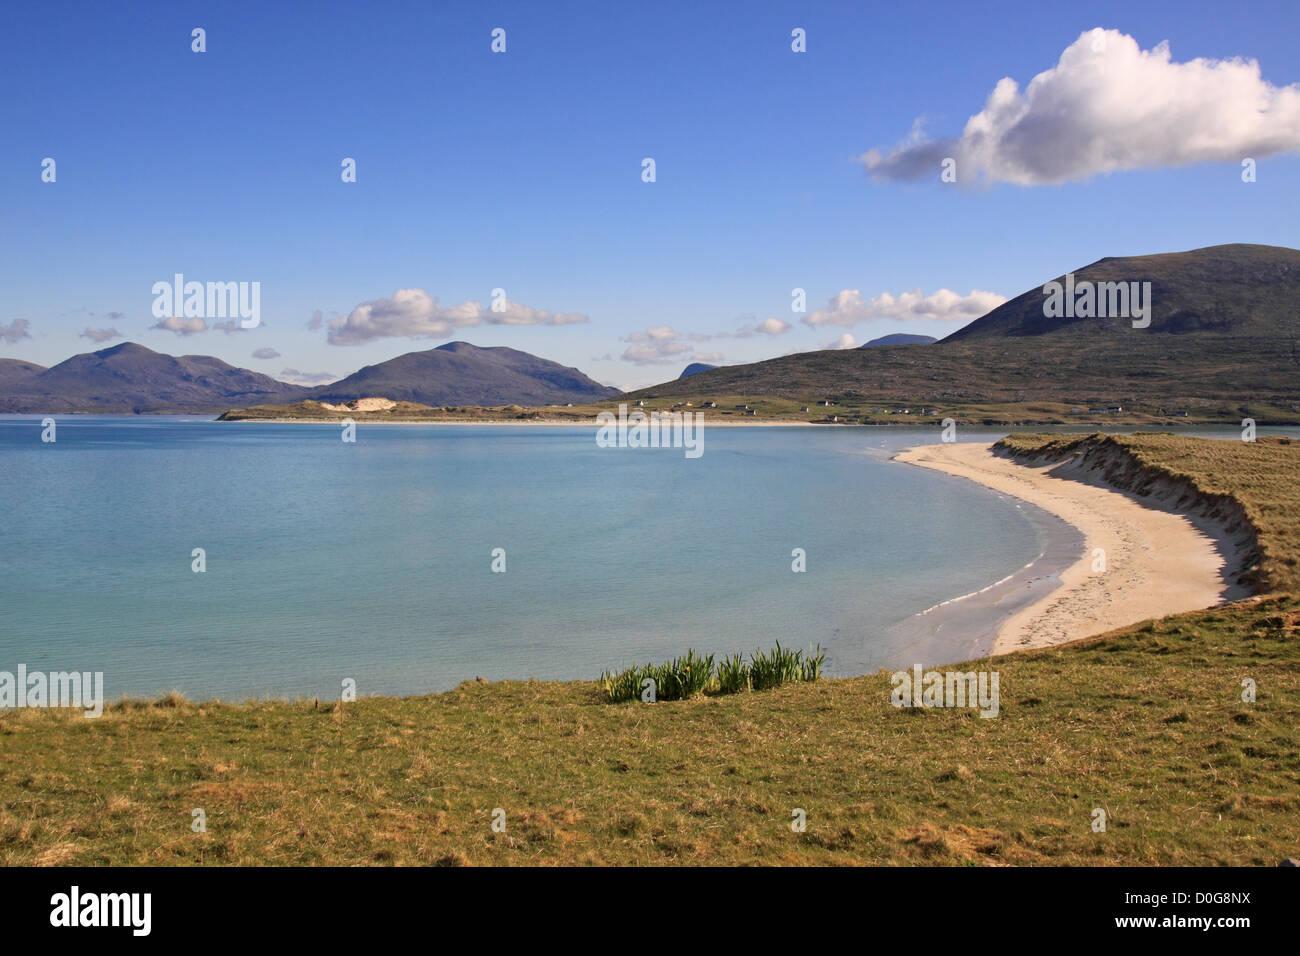 UK Scotland Western Isles Isle of Harris Seilbost Bay and the Harris Mountains - Stock Image